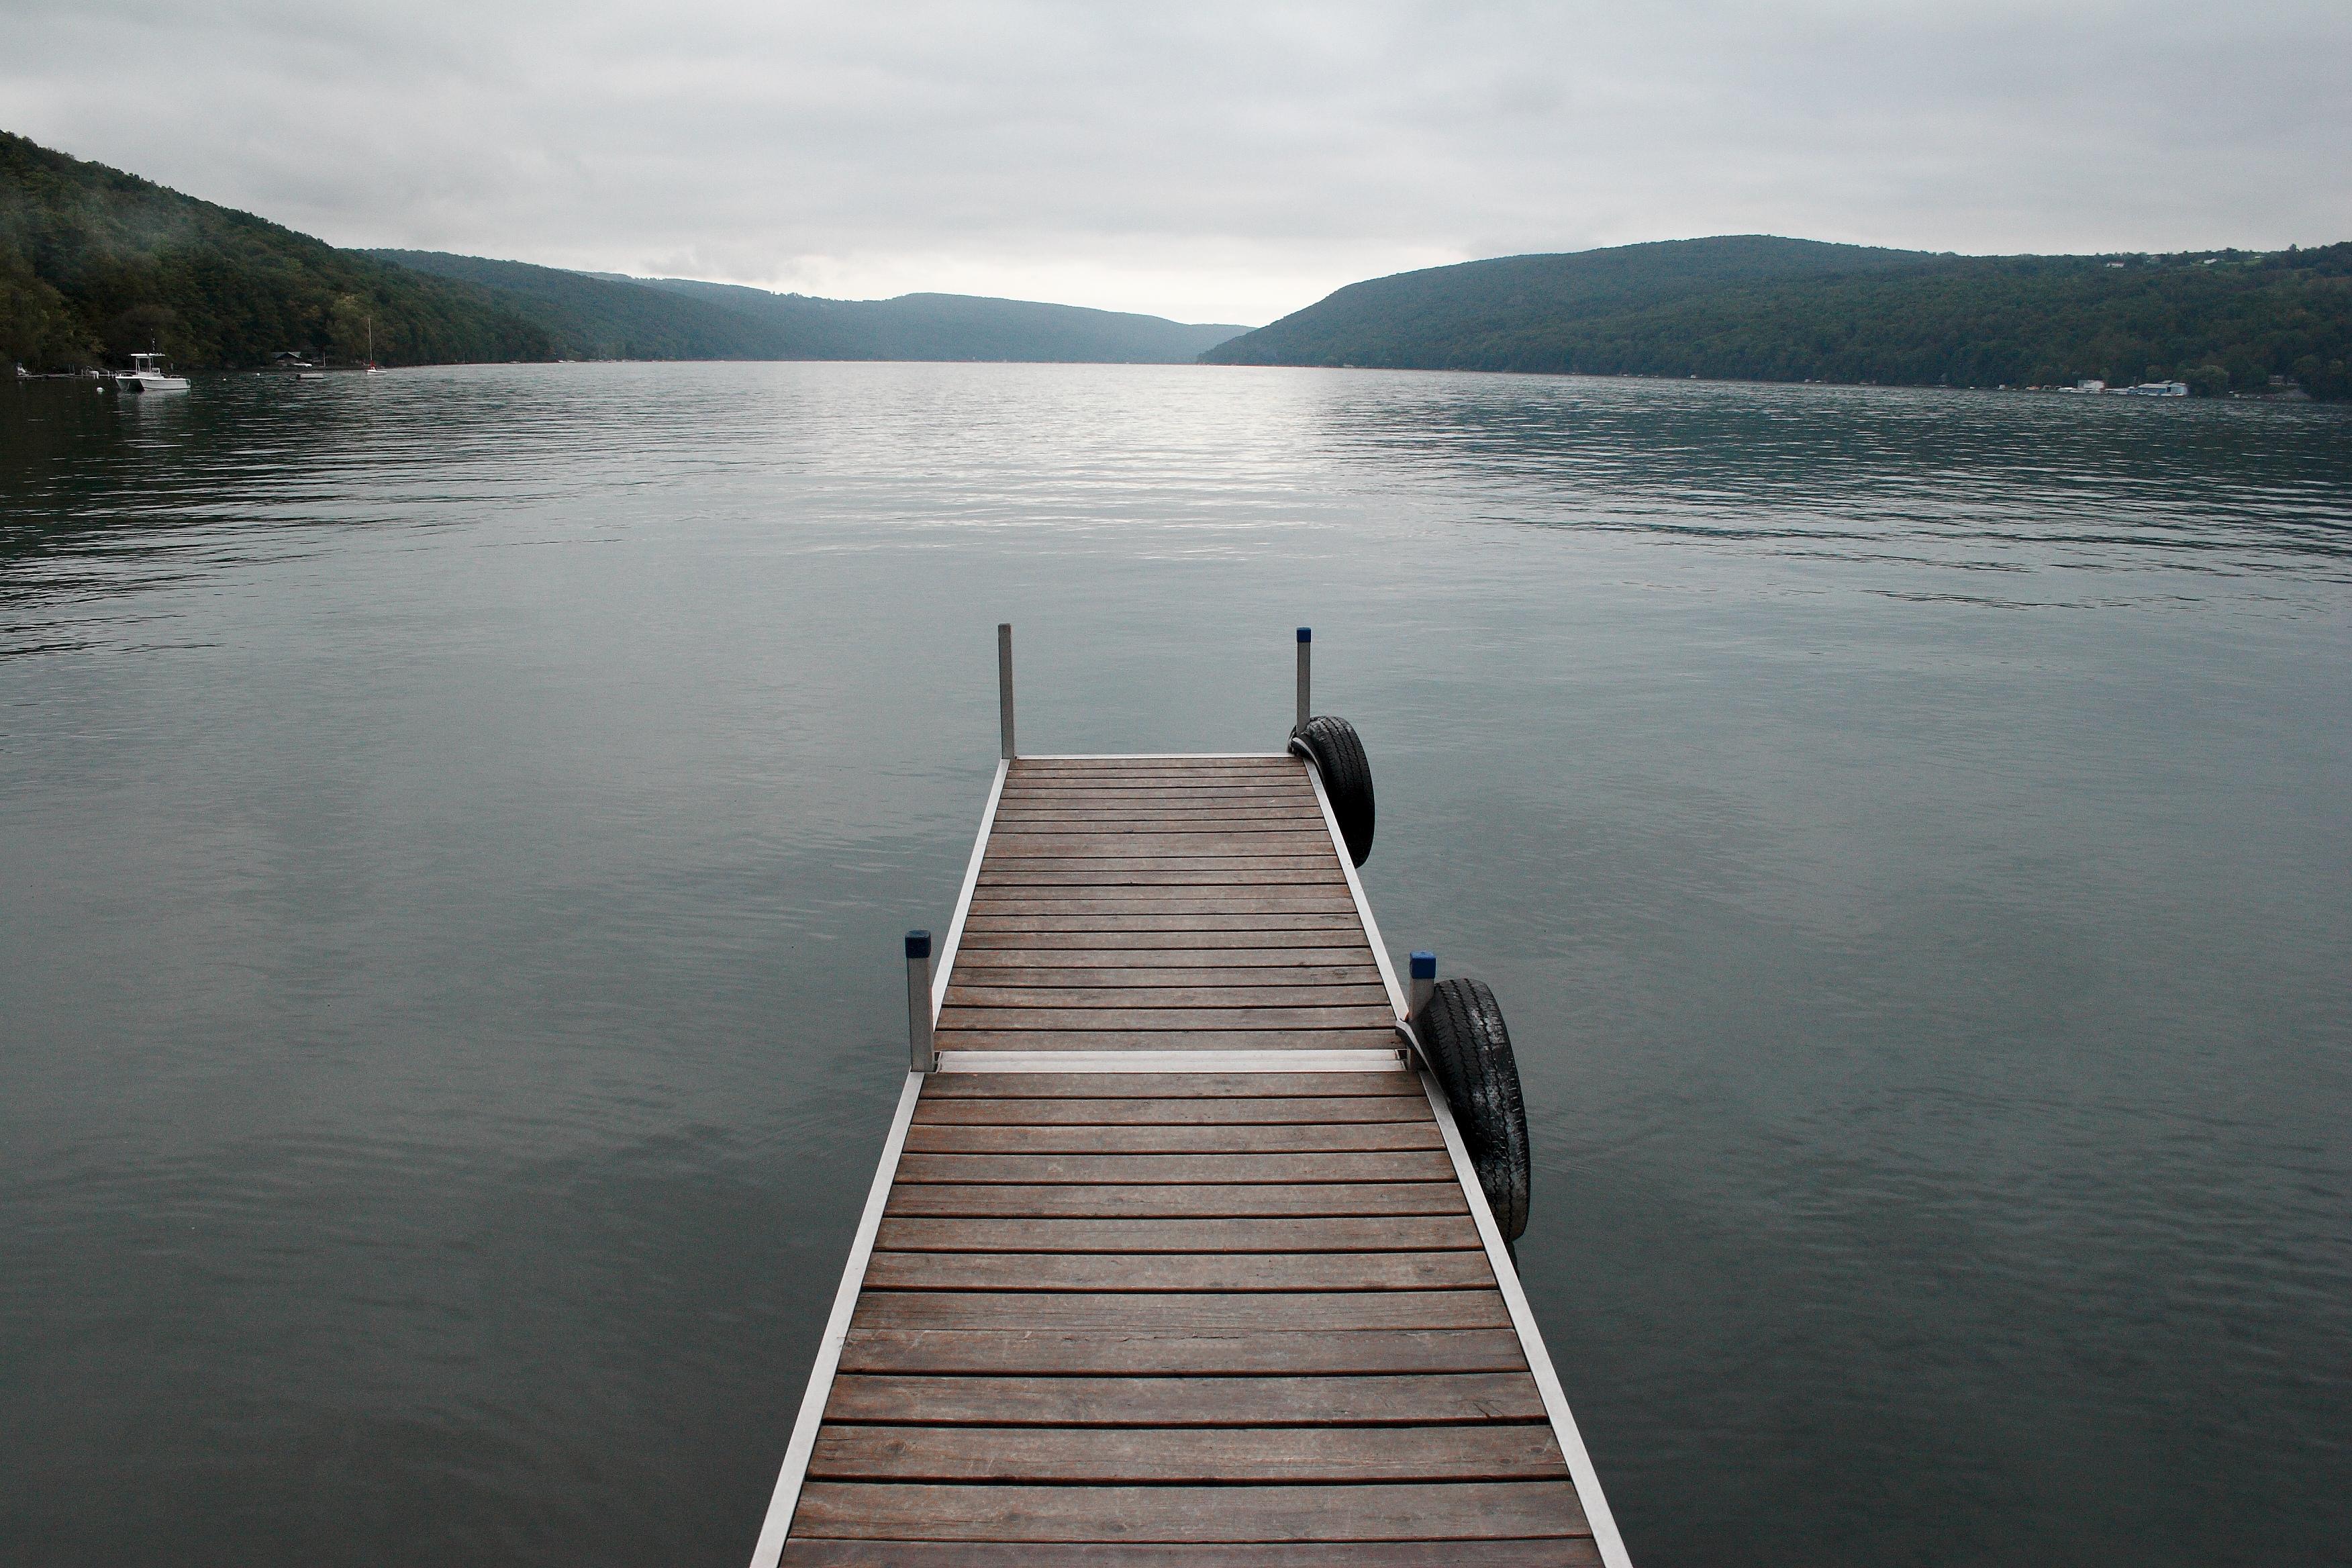 File:Skaneateles Lake, New York, pier.jpg - Wikimedia Commons